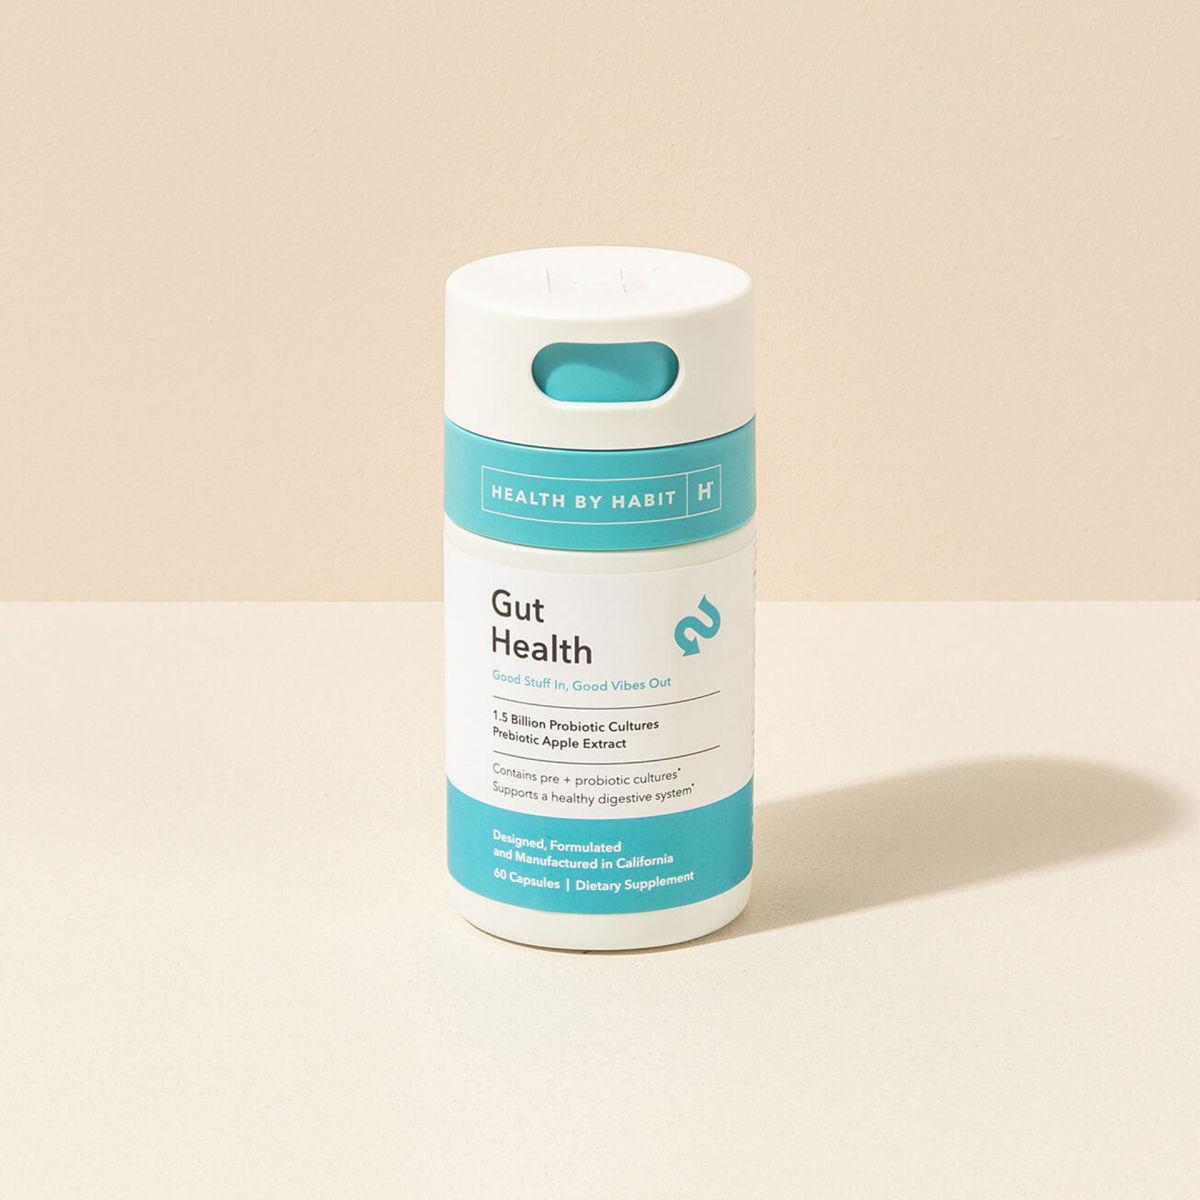 HealthByHabit